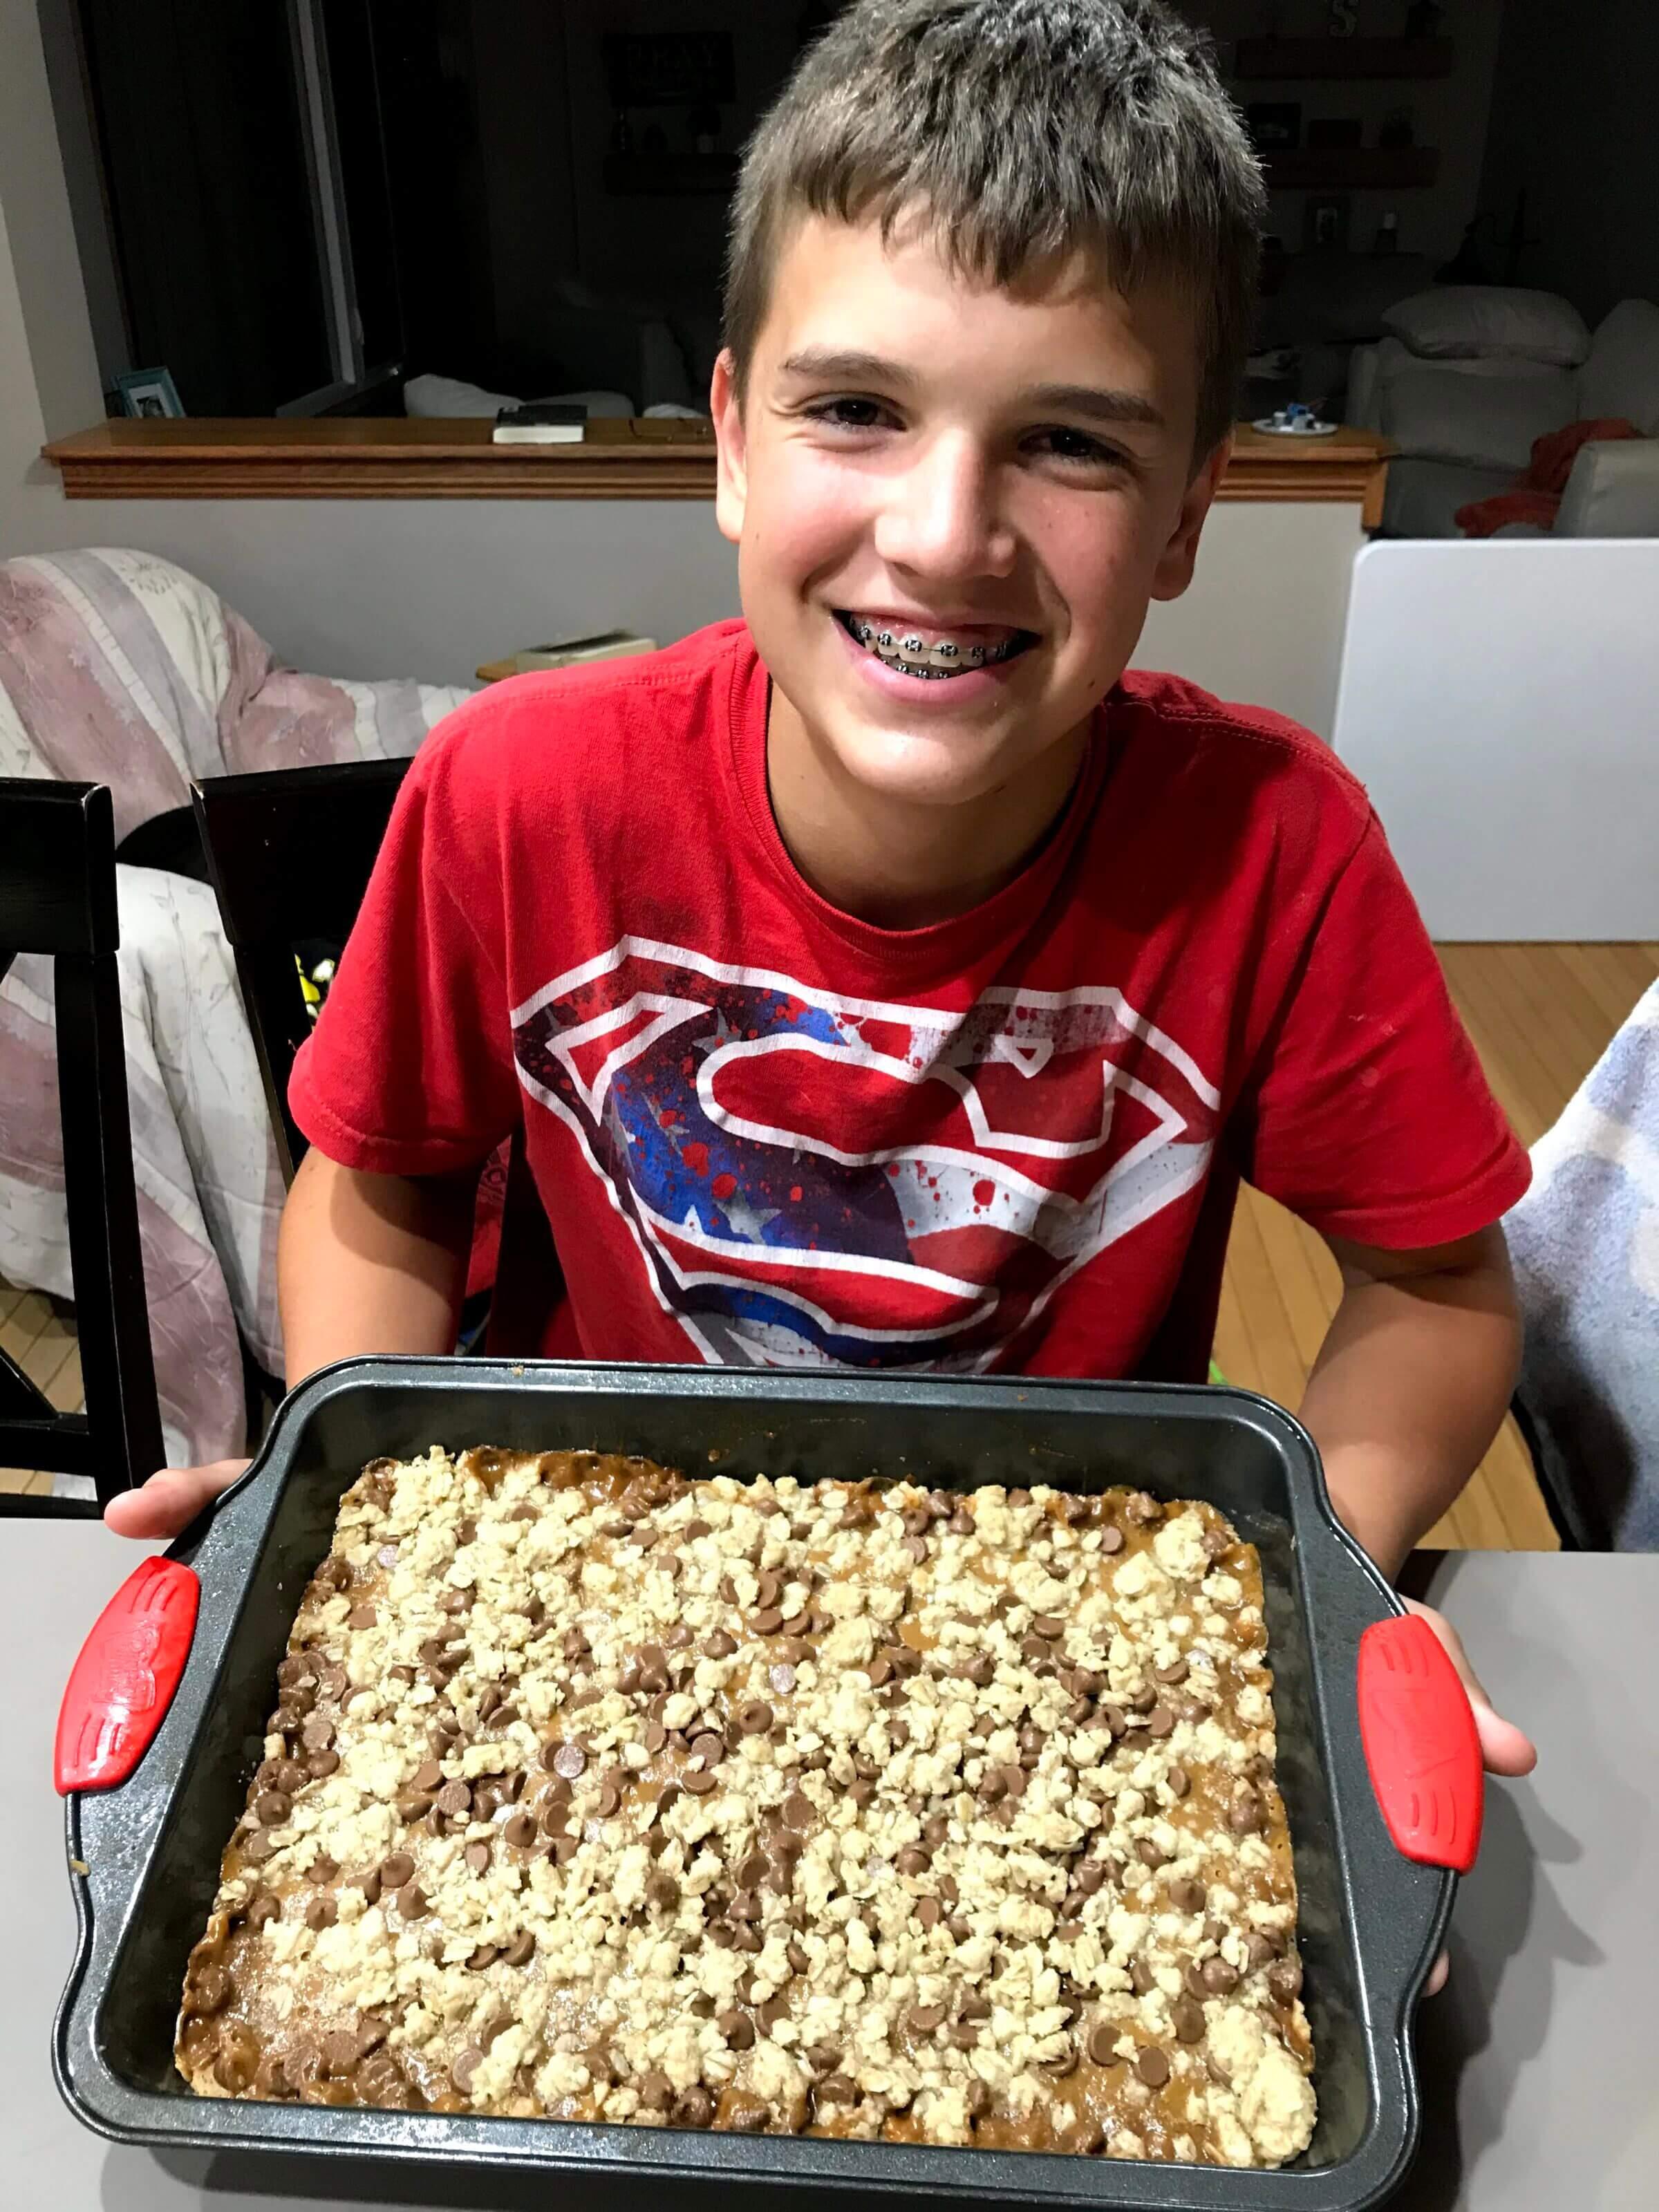 Boy with pan of chocolate caramel oatmeal chews